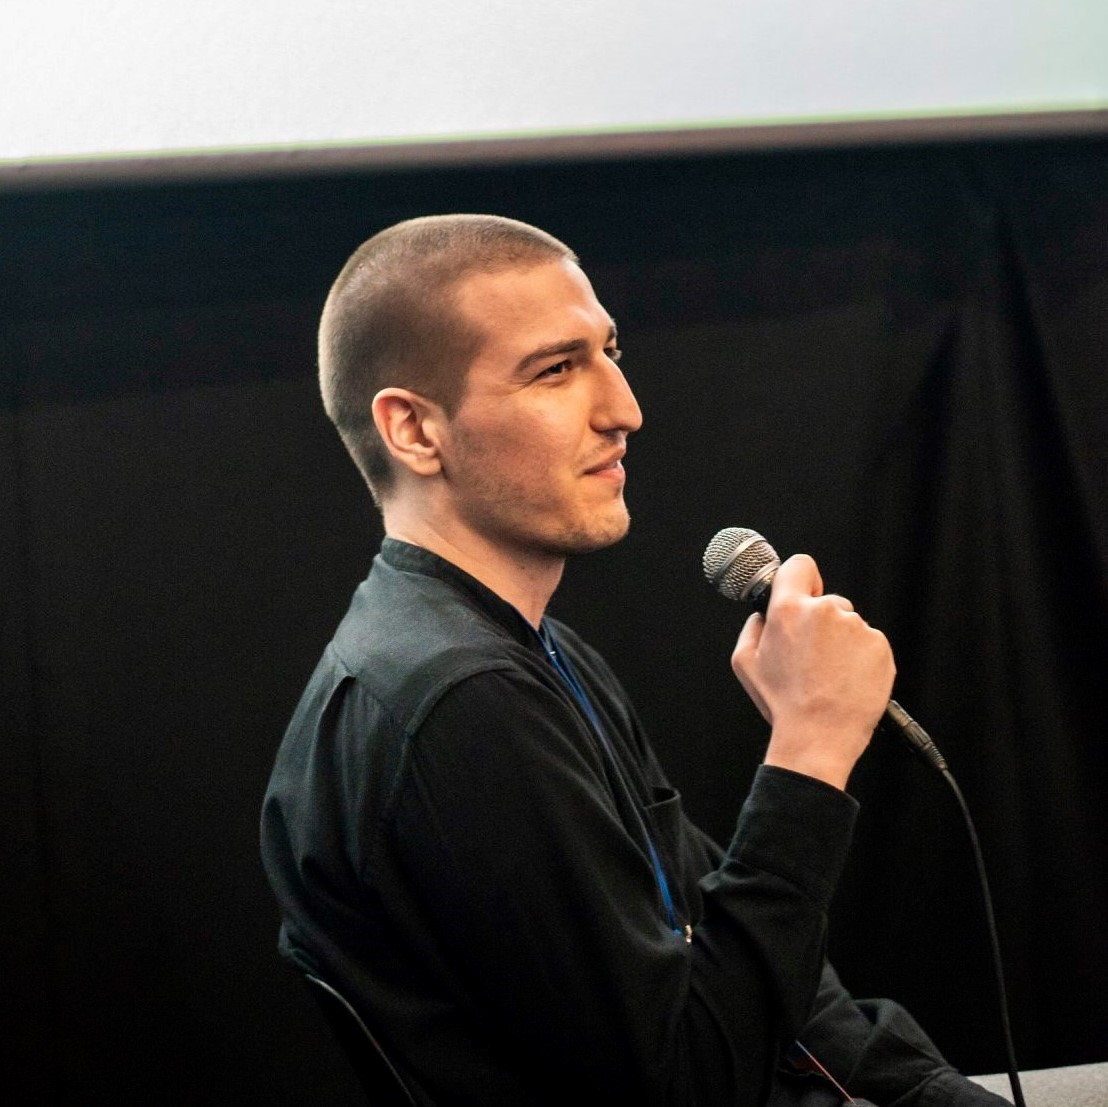 Milos Jovanovic Founder and CEO at Geometrid